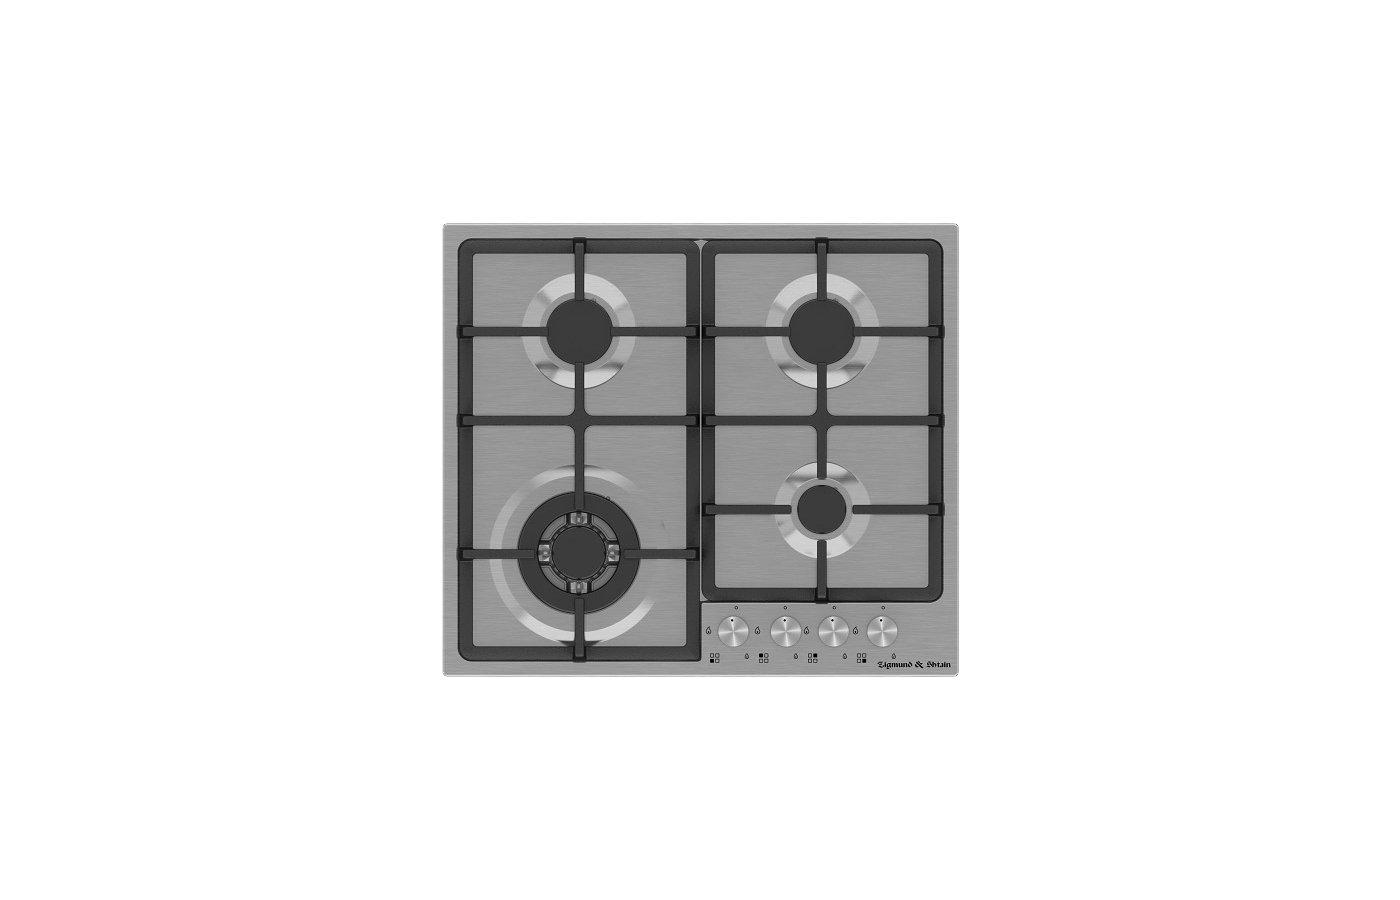 Варочная панель Zigmund & Shtain GN 88.61 X